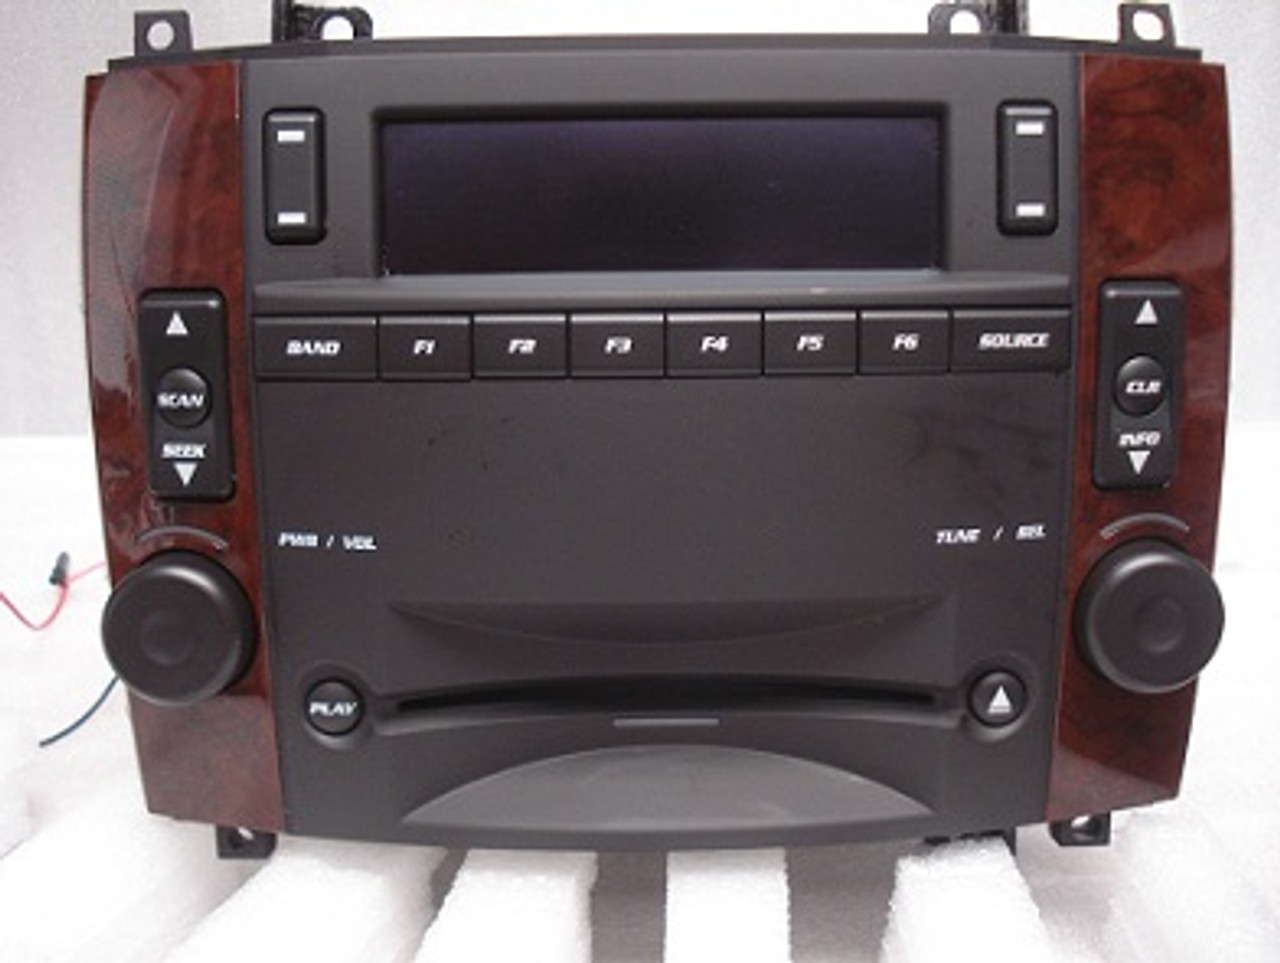 [ZSVE_7041]  03 04 05 06 07 Cadillac CTS SRX Radio CD Player OEM Stereo   Cadillac Cts 05 Xm Radio Box      CD4Car